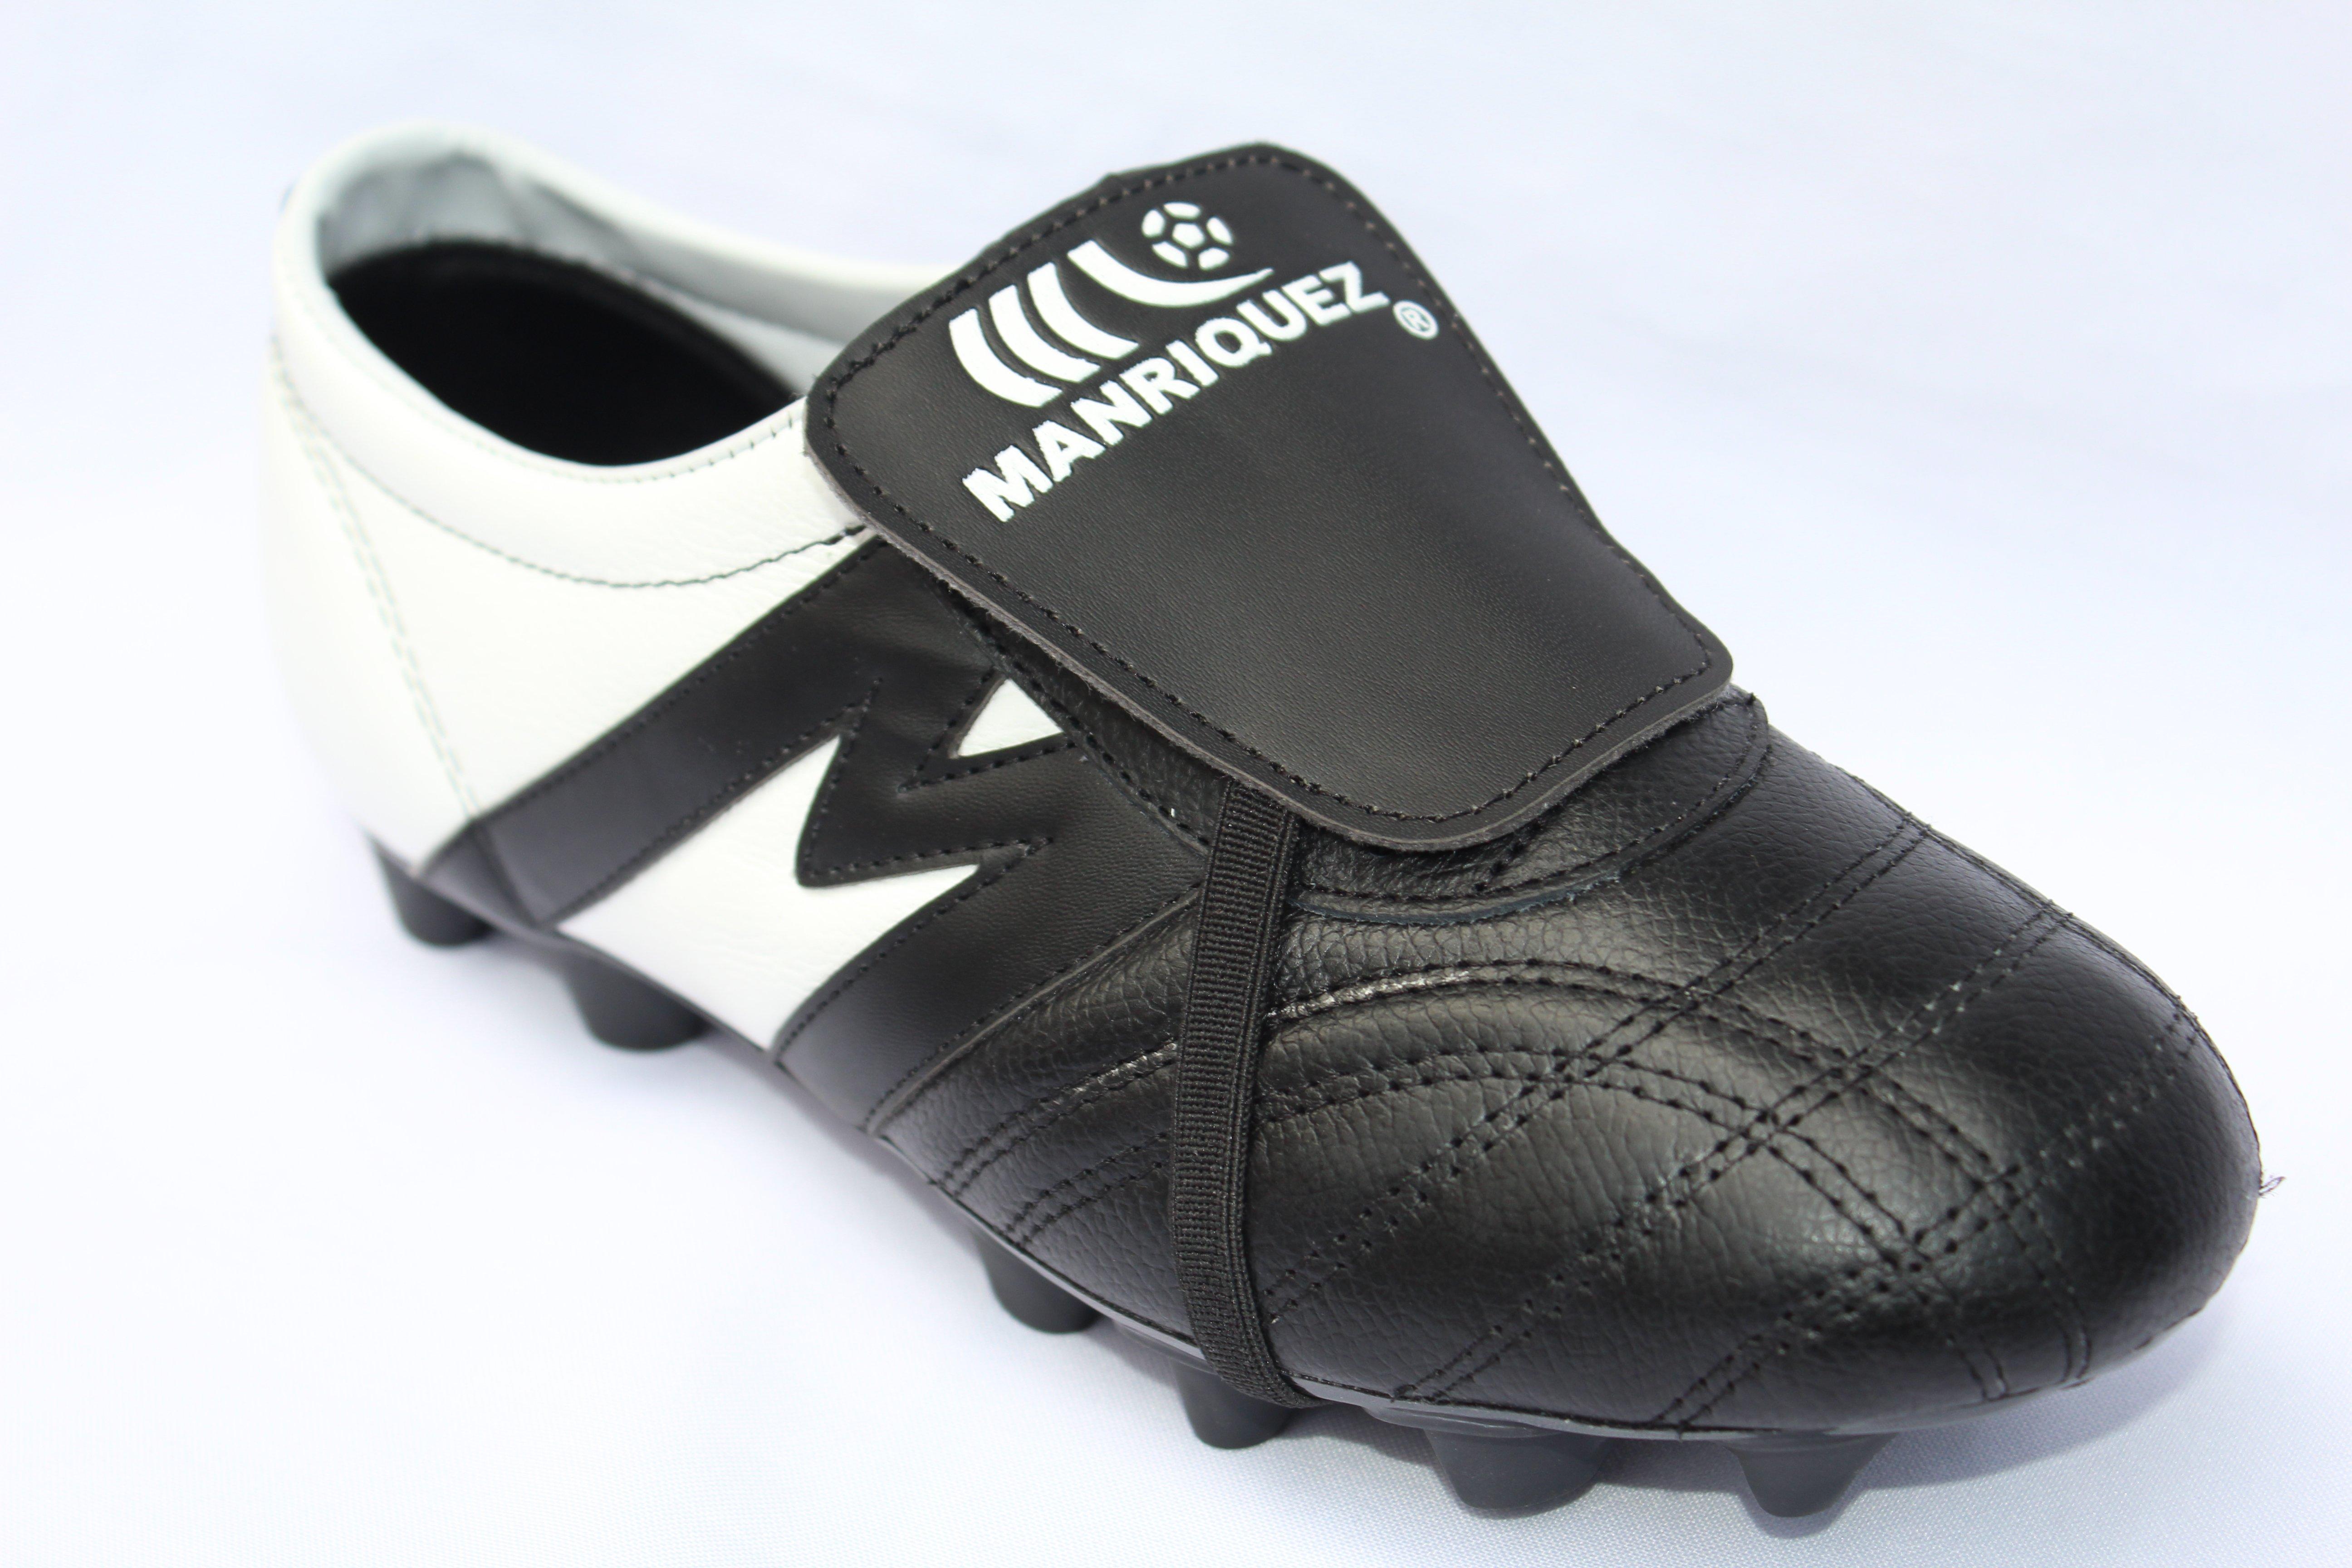 2244-Zapato de Fútbol Manriquez MID Eclipse SX Negro/Blanco